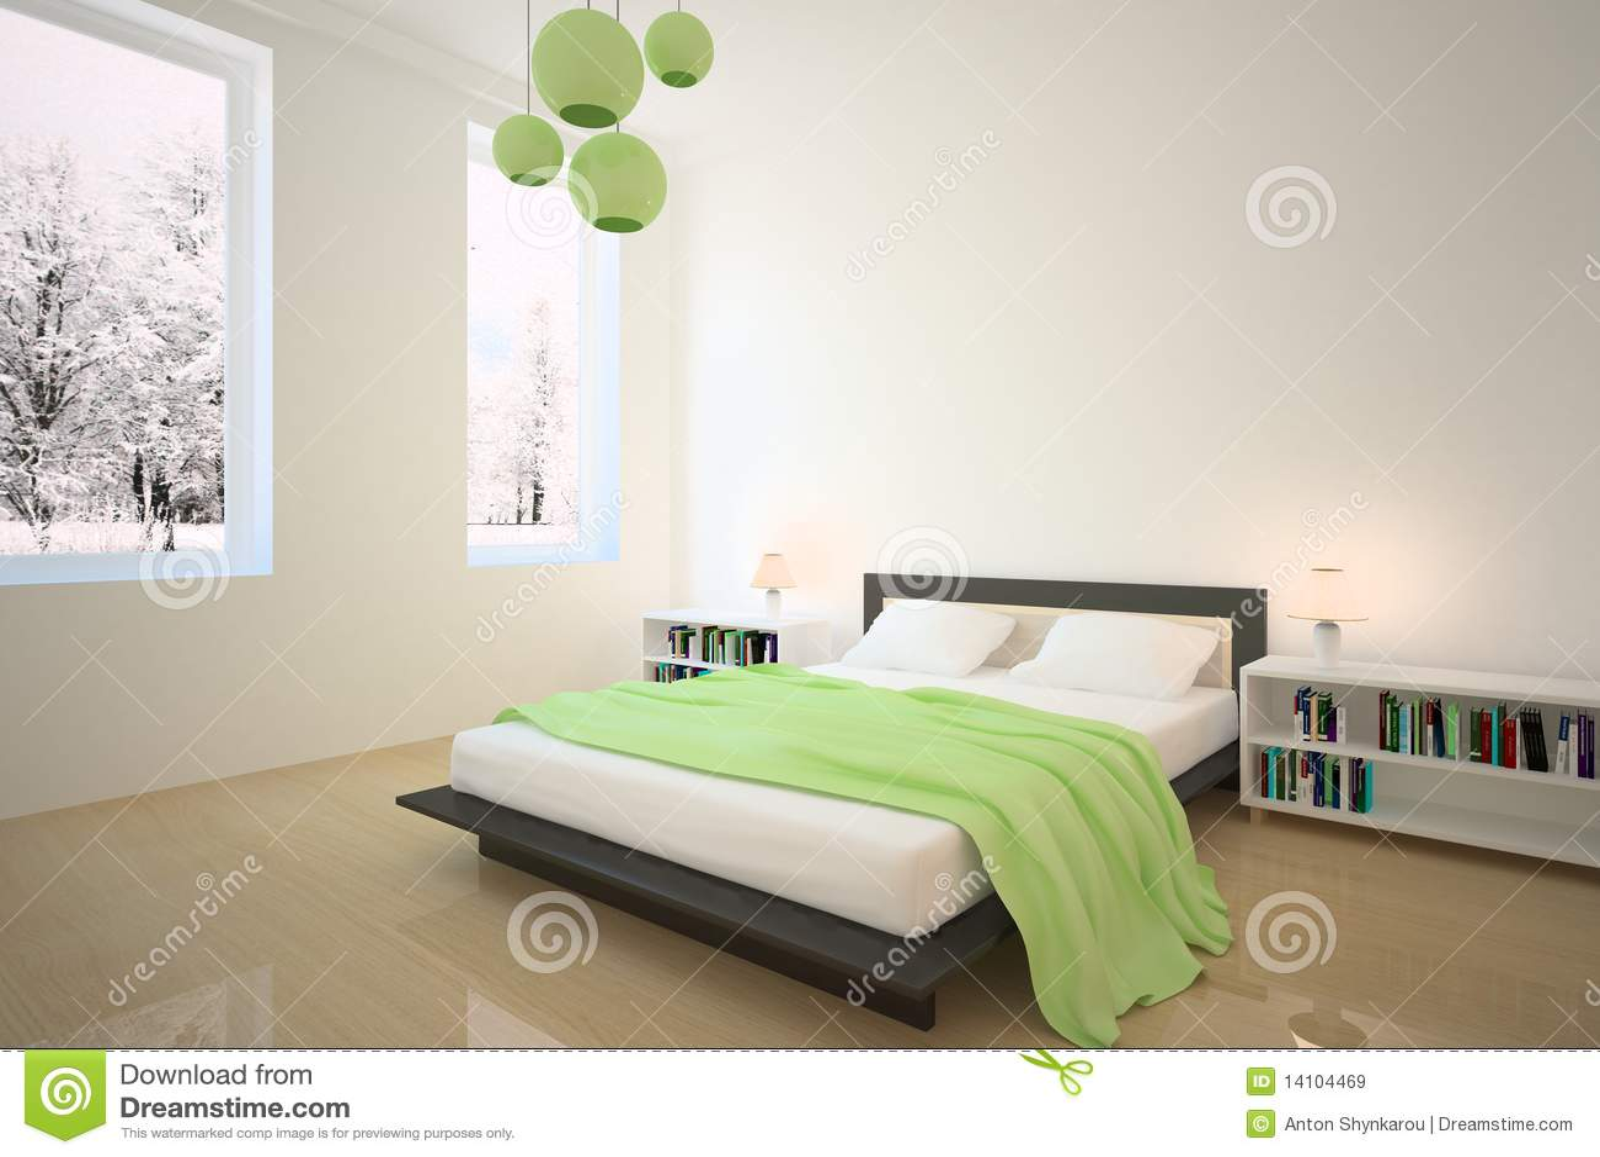 gr nes schlafzimmer lizenzfreie stockbilder bild 14104469. Black Bedroom Furniture Sets. Home Design Ideas